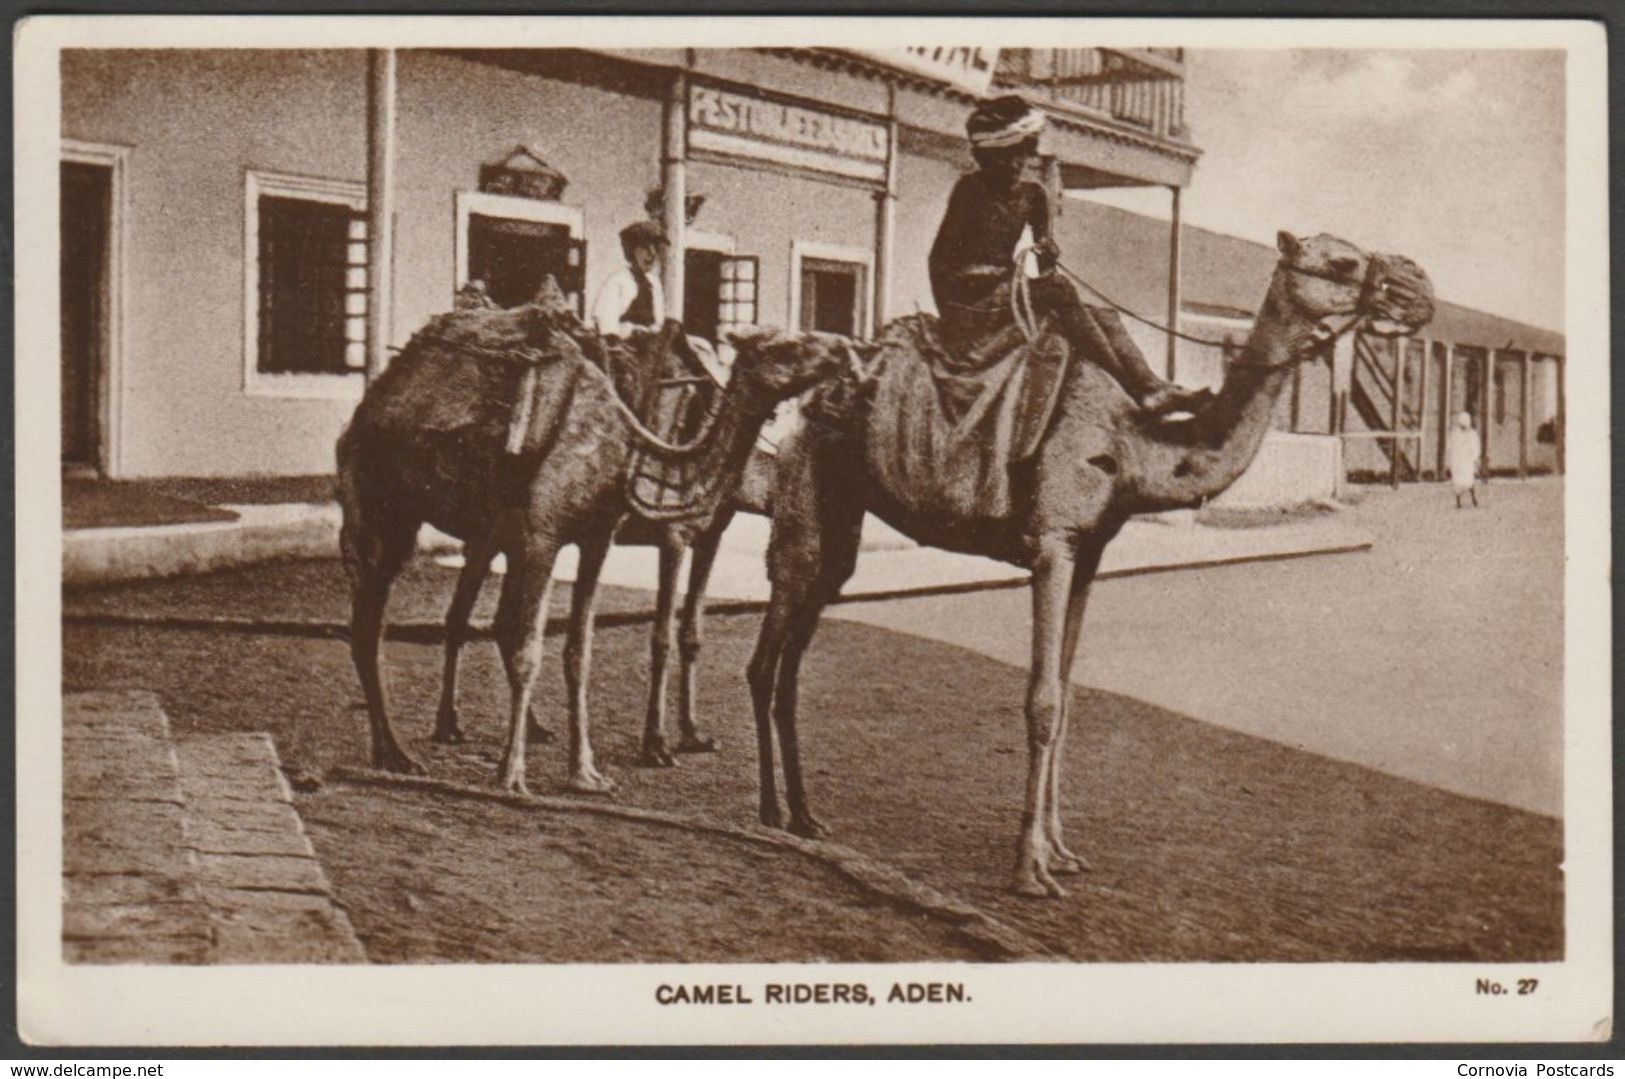 Camel Riders, Aden, C.1920s - Lehem RP Postcard - Yemen